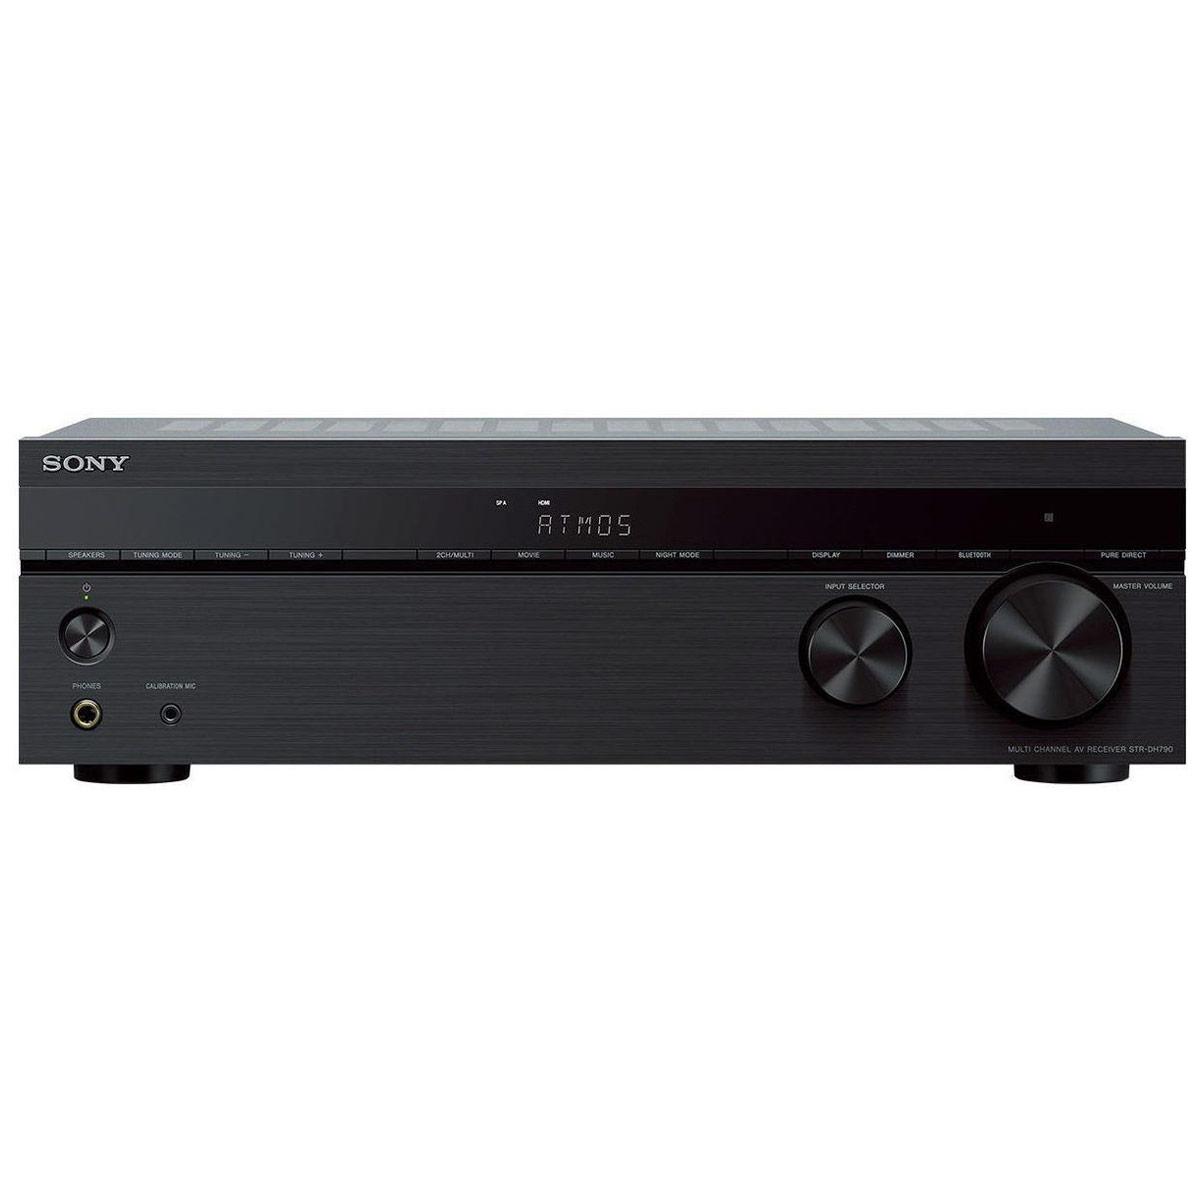 Ampli home cinéma Sony STR-DH790 Ampli-tuner Home Cinema 7.2 3D Ready - 145W/Canal - Dolby Atmos / DTS:X - Pass-through 4K HDR - 4 entrées HDMI 2.0 HDCP 2.2 - Bluetooth